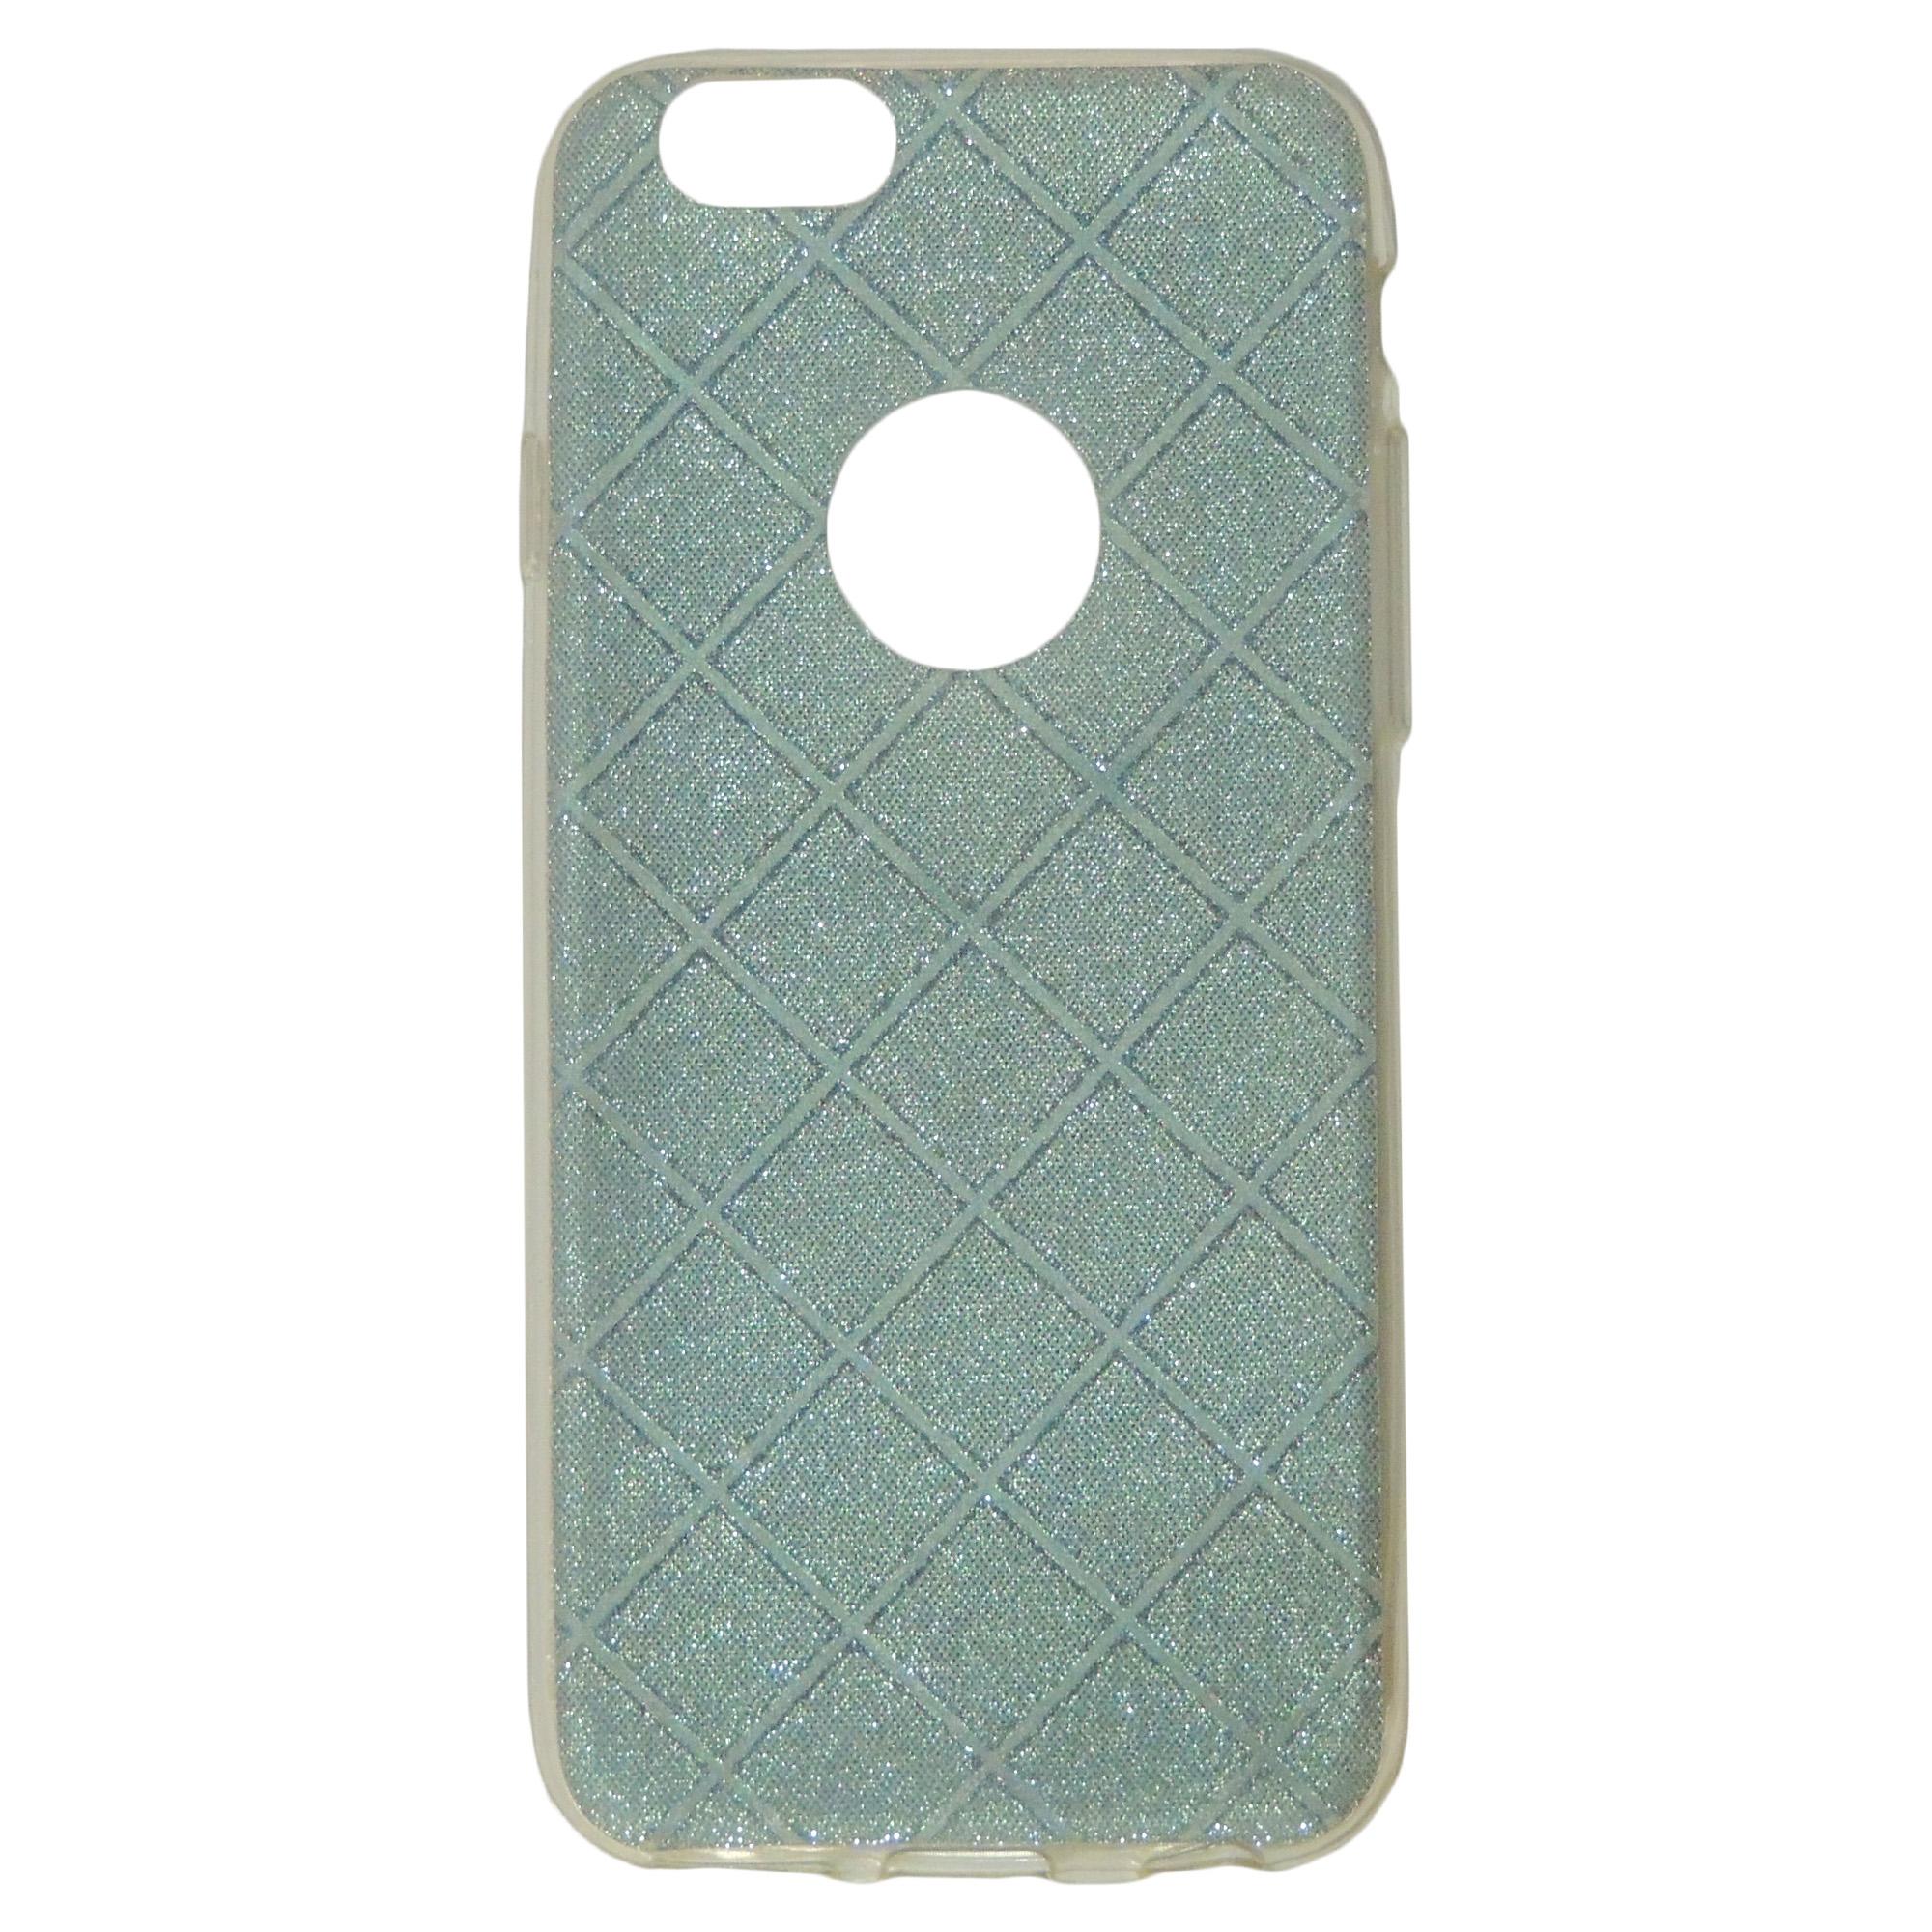 کاور ال جی دی طرح اکلیلی مدل P مناسب برای گوشی موبایل اپل Iphone 6/6s